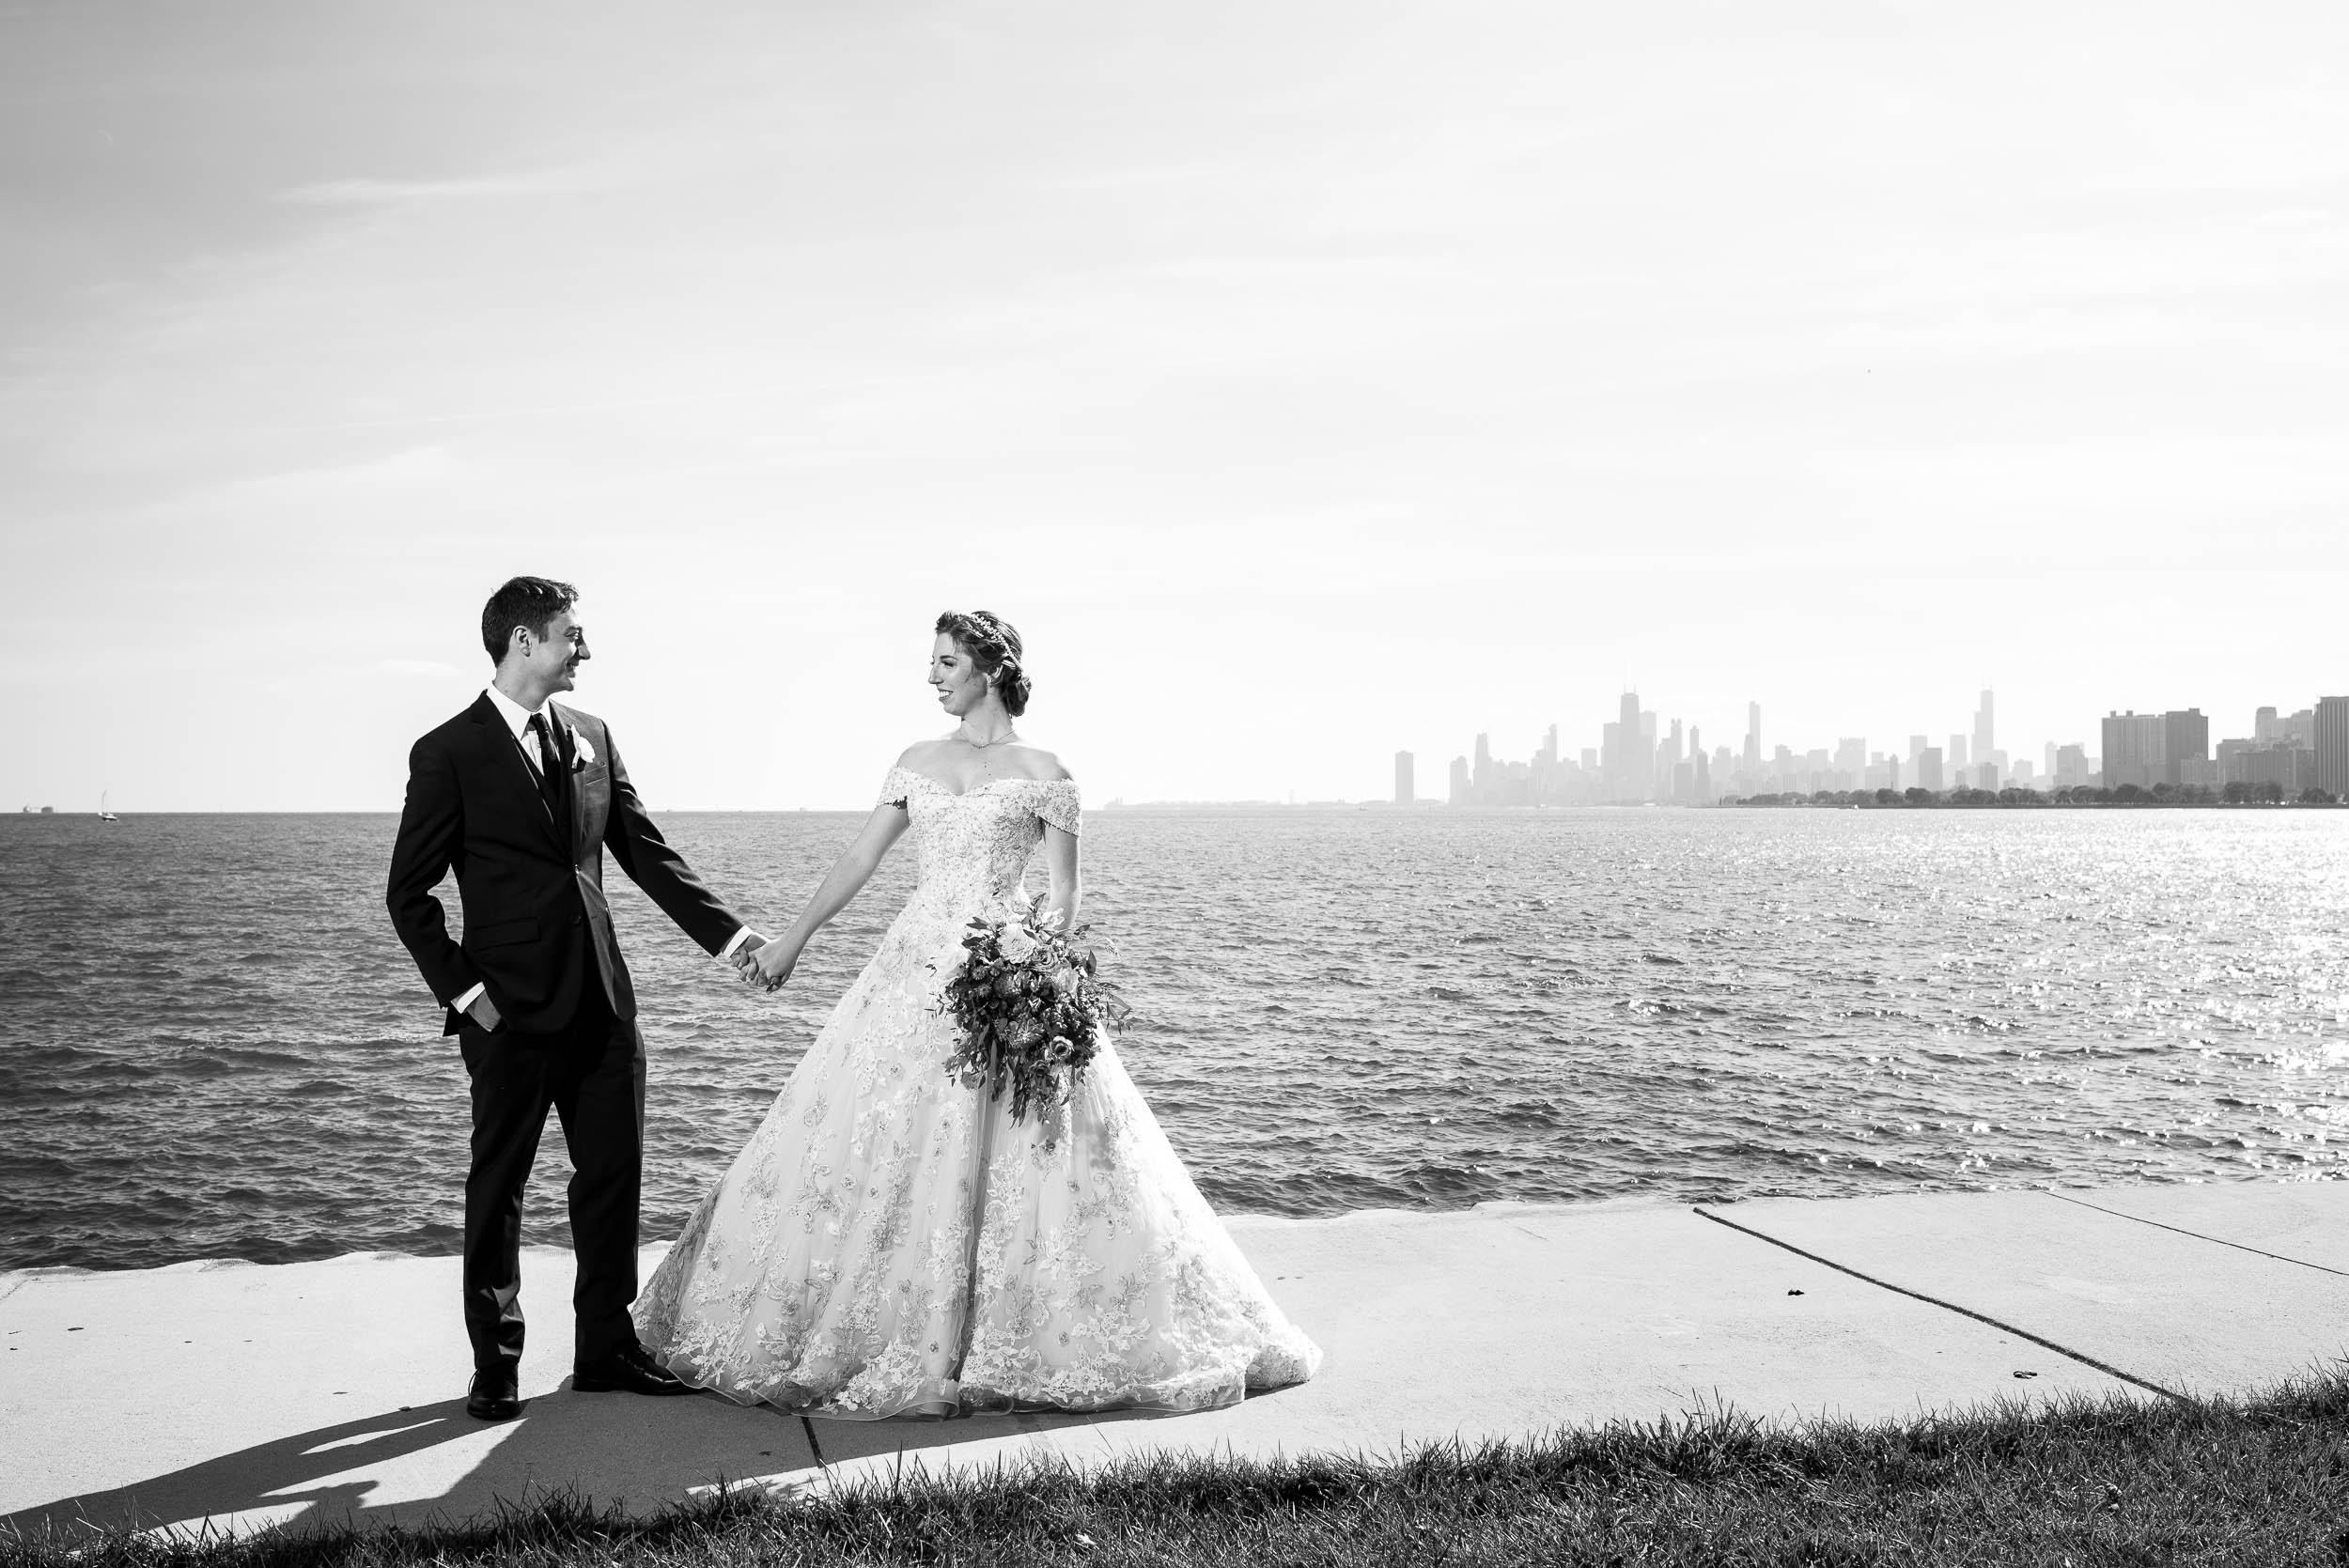 Bride and groom portrait at Montrose Harbor Chicago.